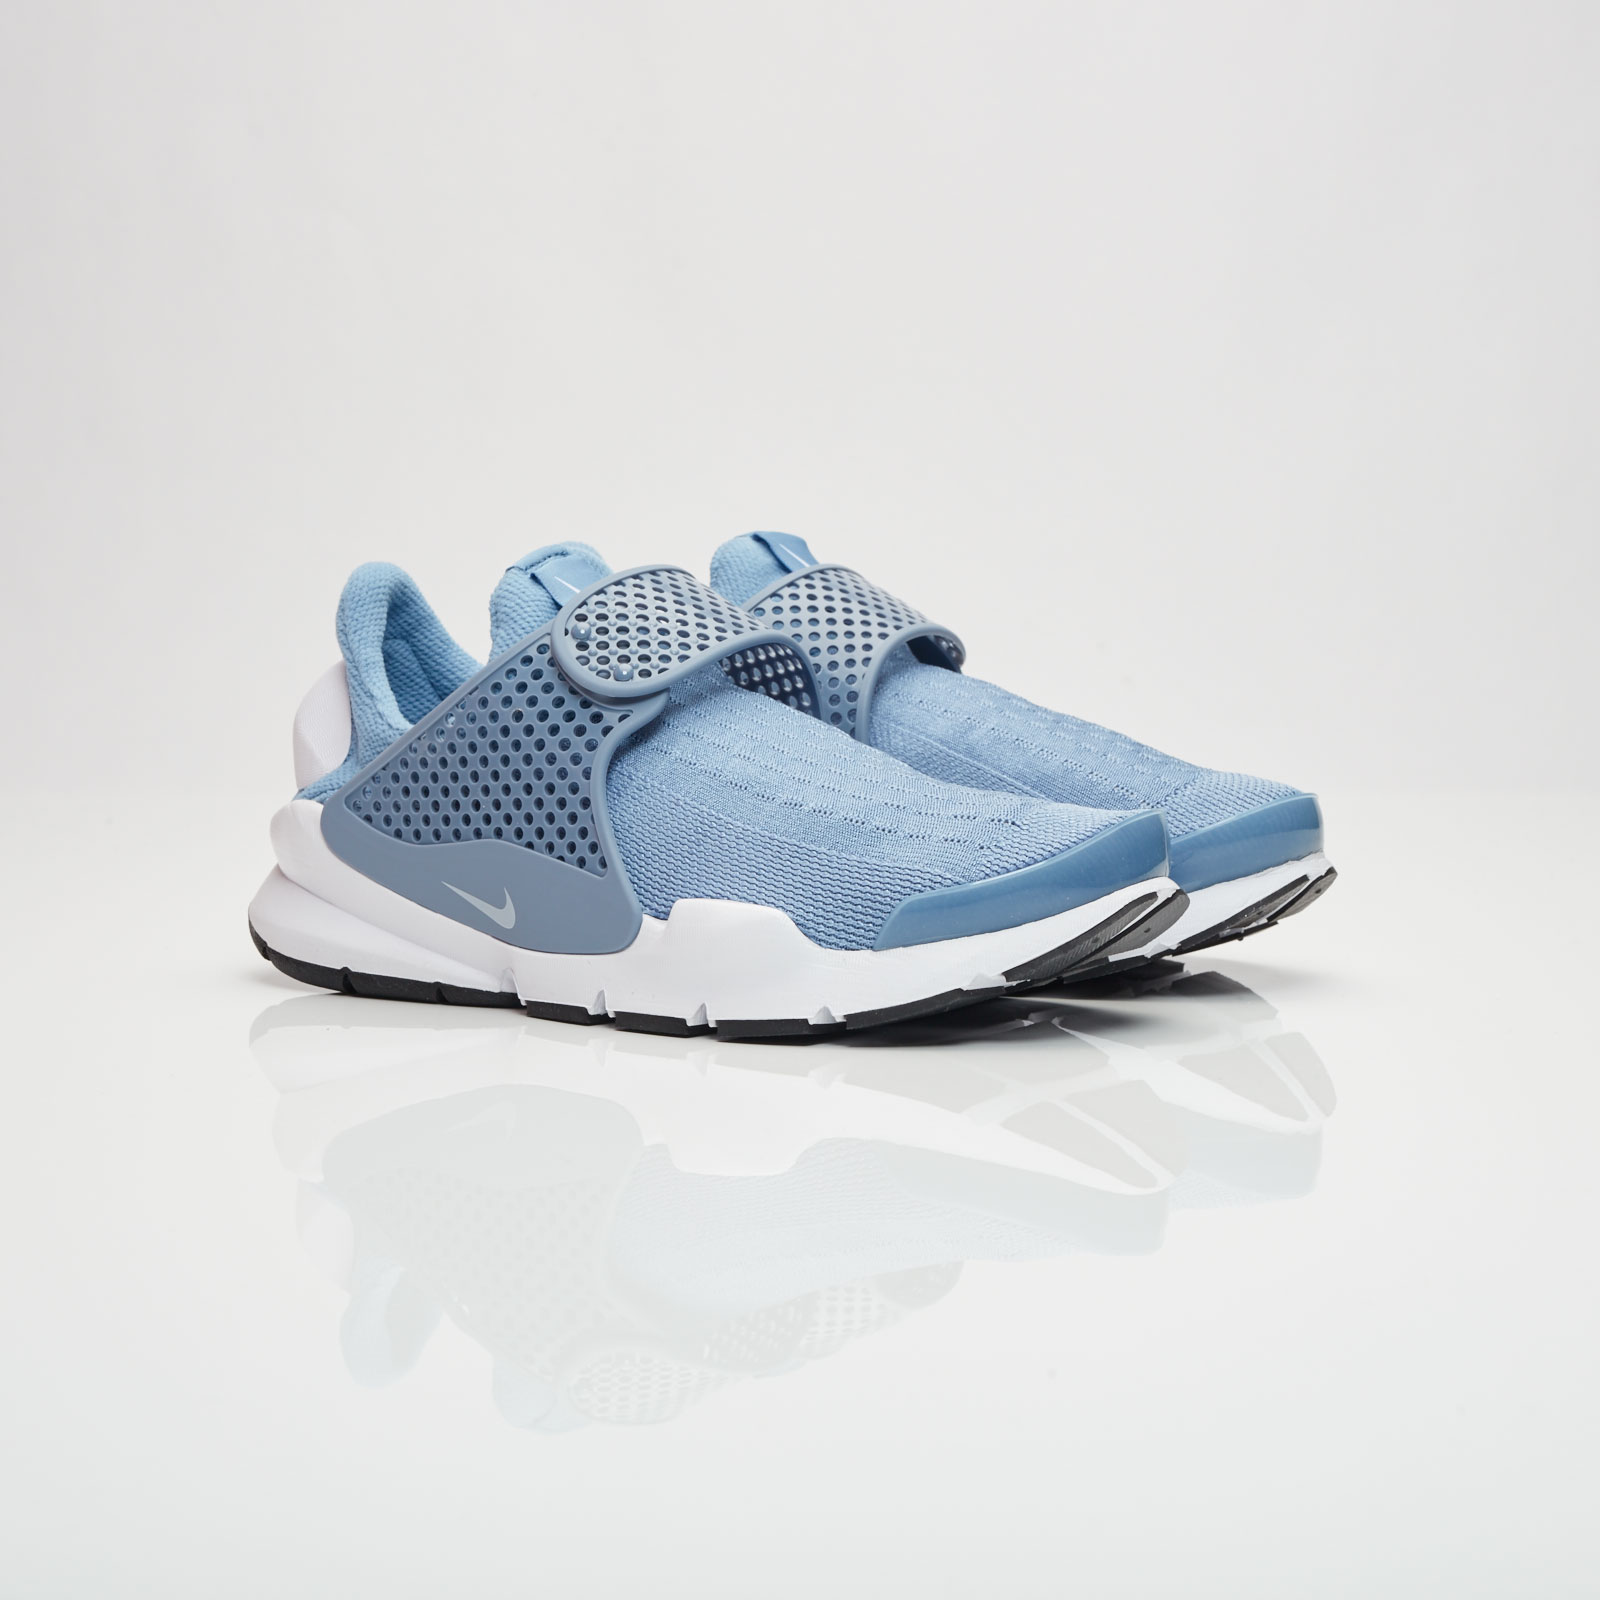 separation shoes 45274 dadf0 Nike Sportswear Wmns Sock Dart